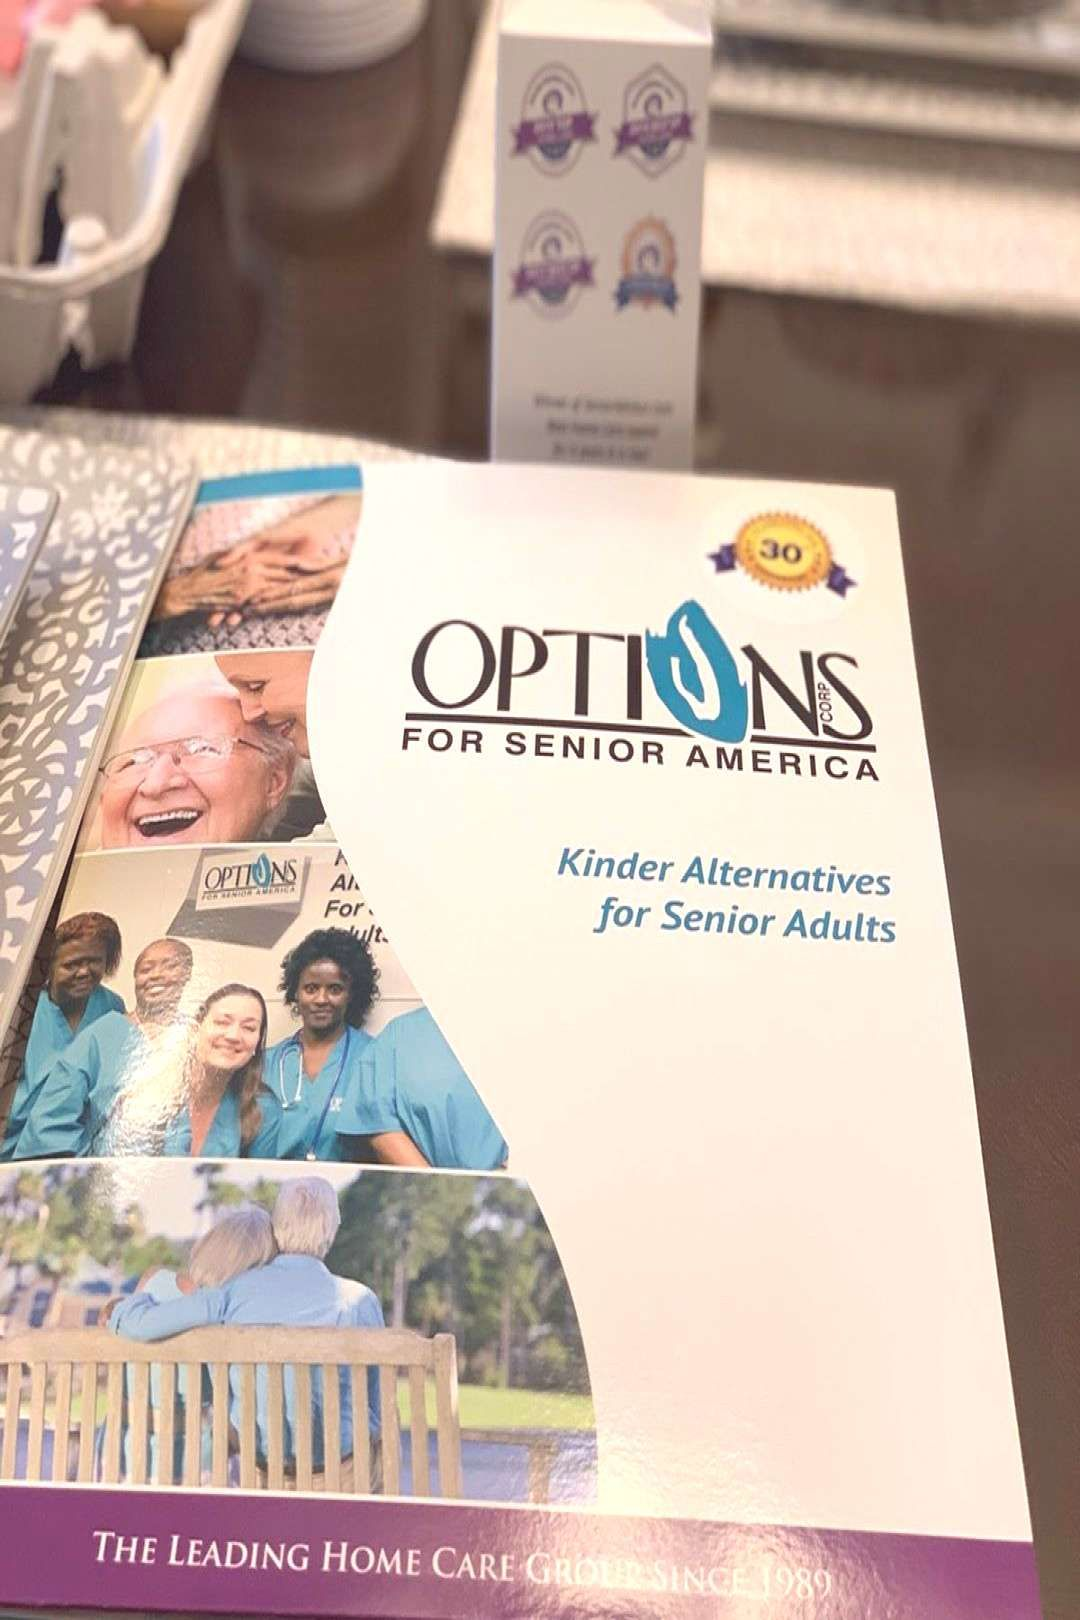 #alternatives #information #possible #leading #session #sunrise #america #options #kinder #senior #living #option #adults #great #fairf Great information session today at Sunris...